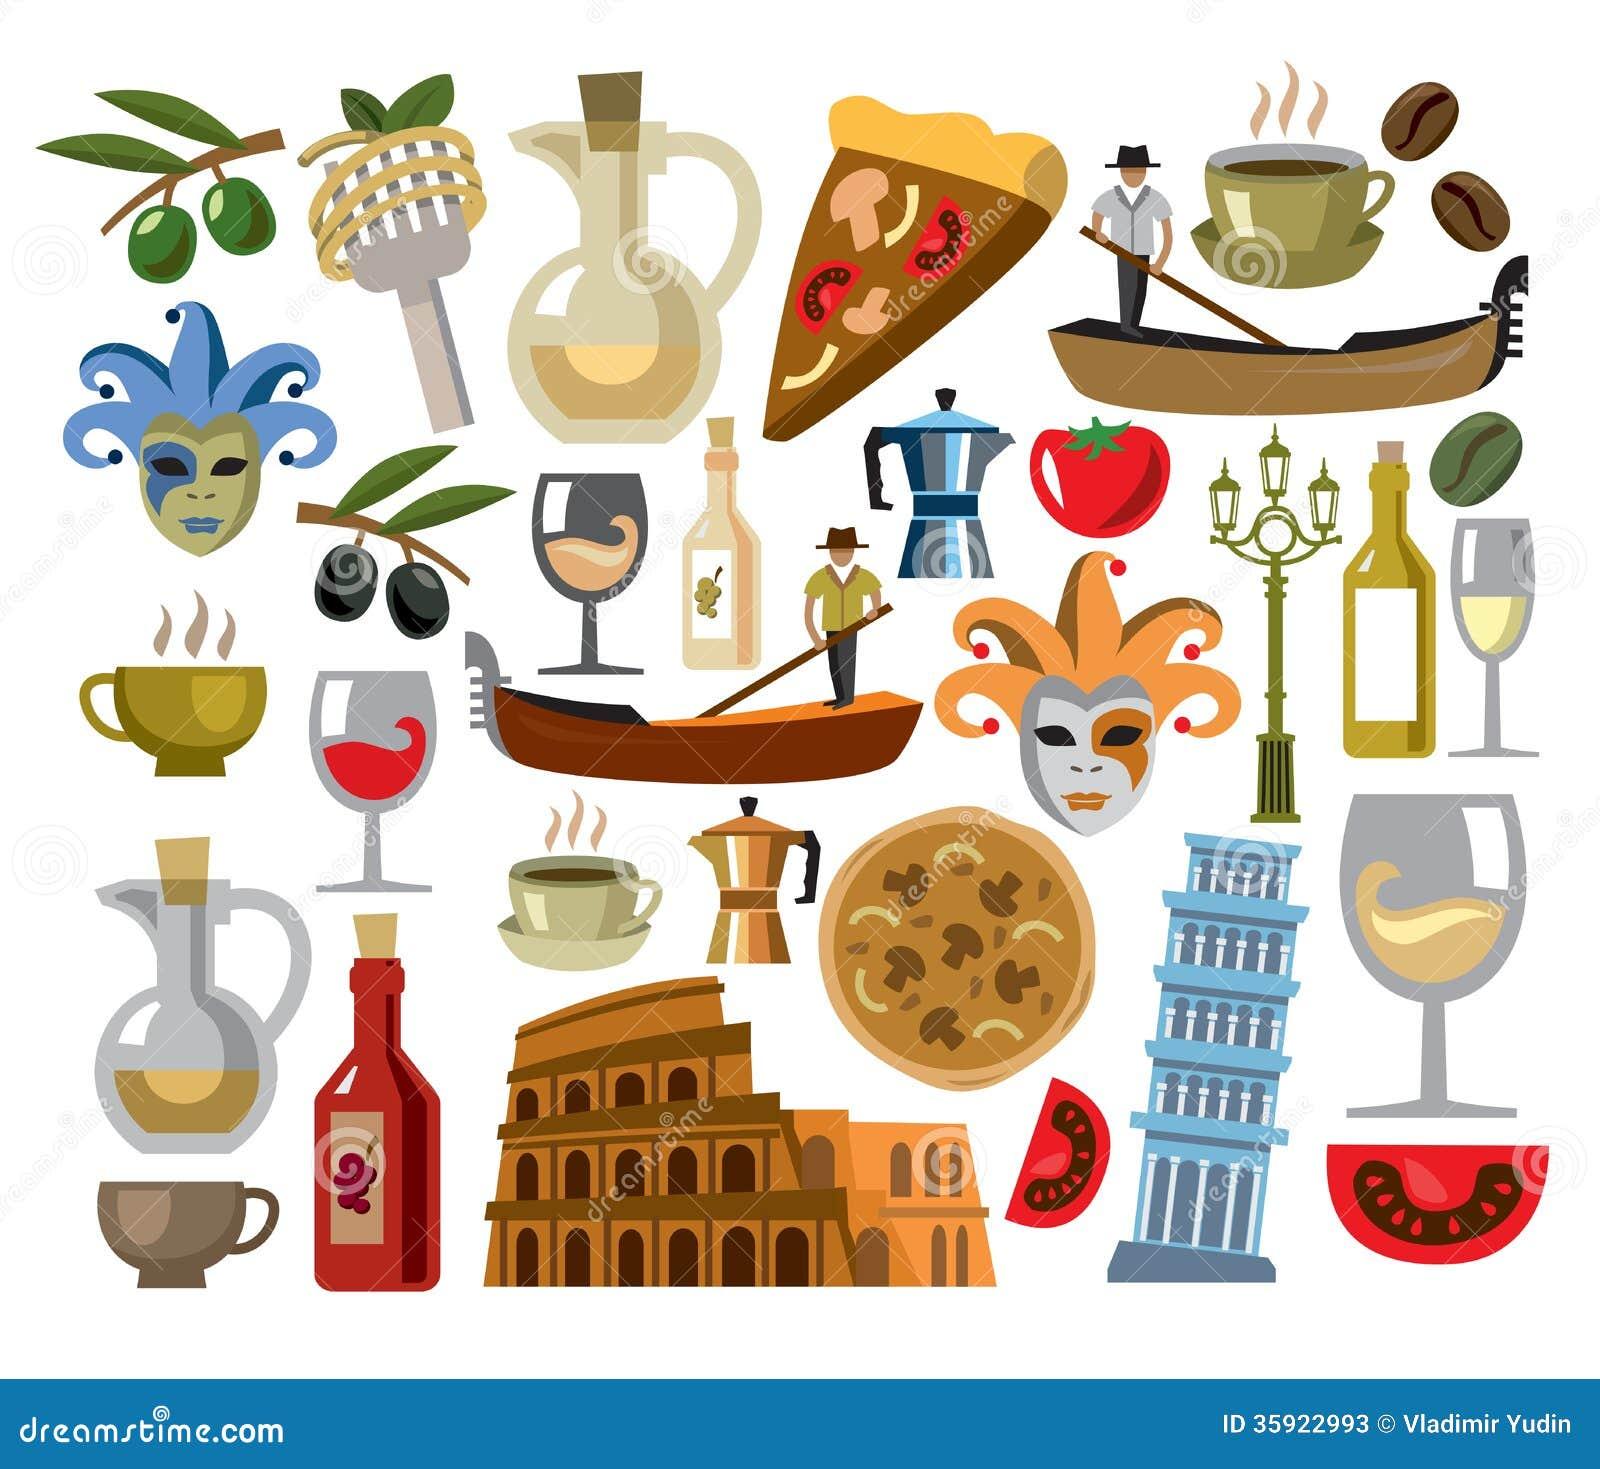 Italian Restaurant Logo With Flag: Vector Italy Icons Set Stock Photos